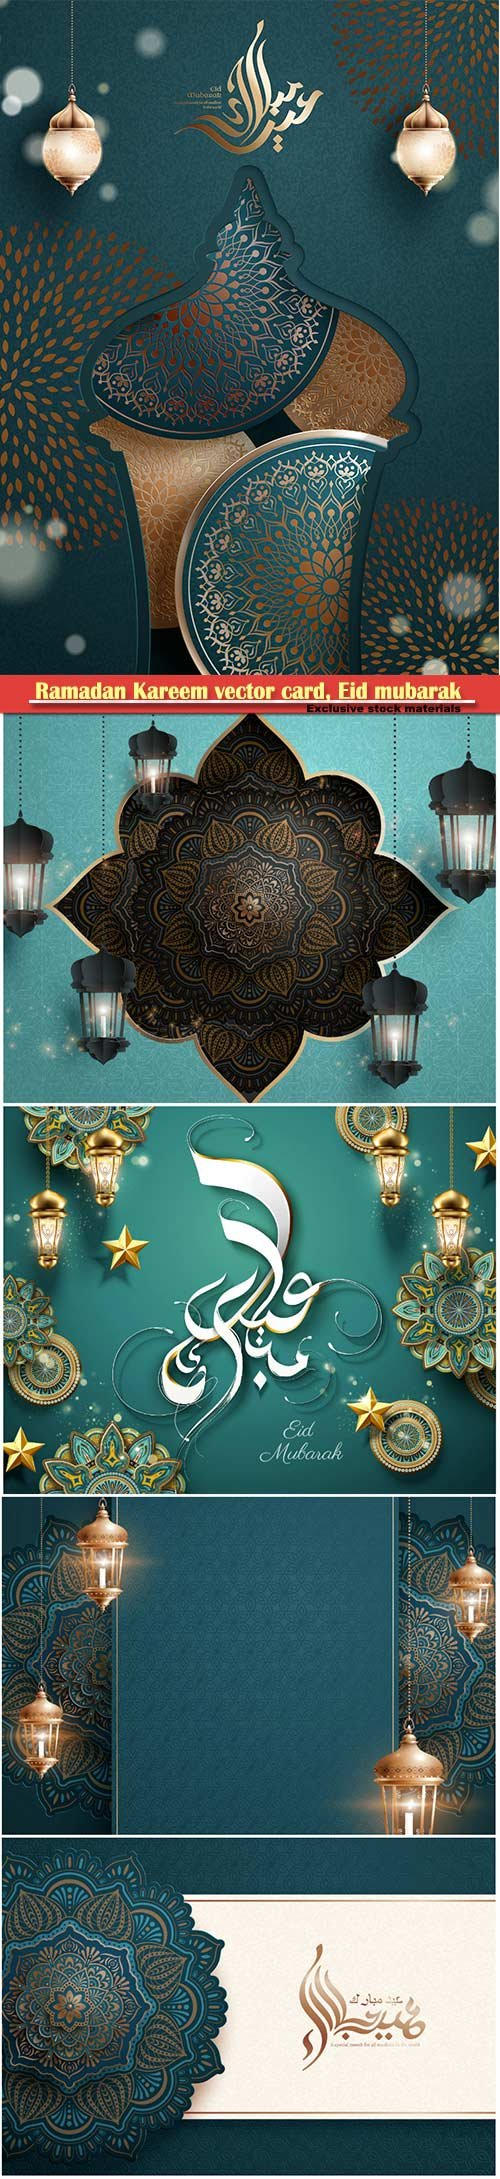 Ramadan Kareem vector card, Eid mubarak calligraphy design templates # 21